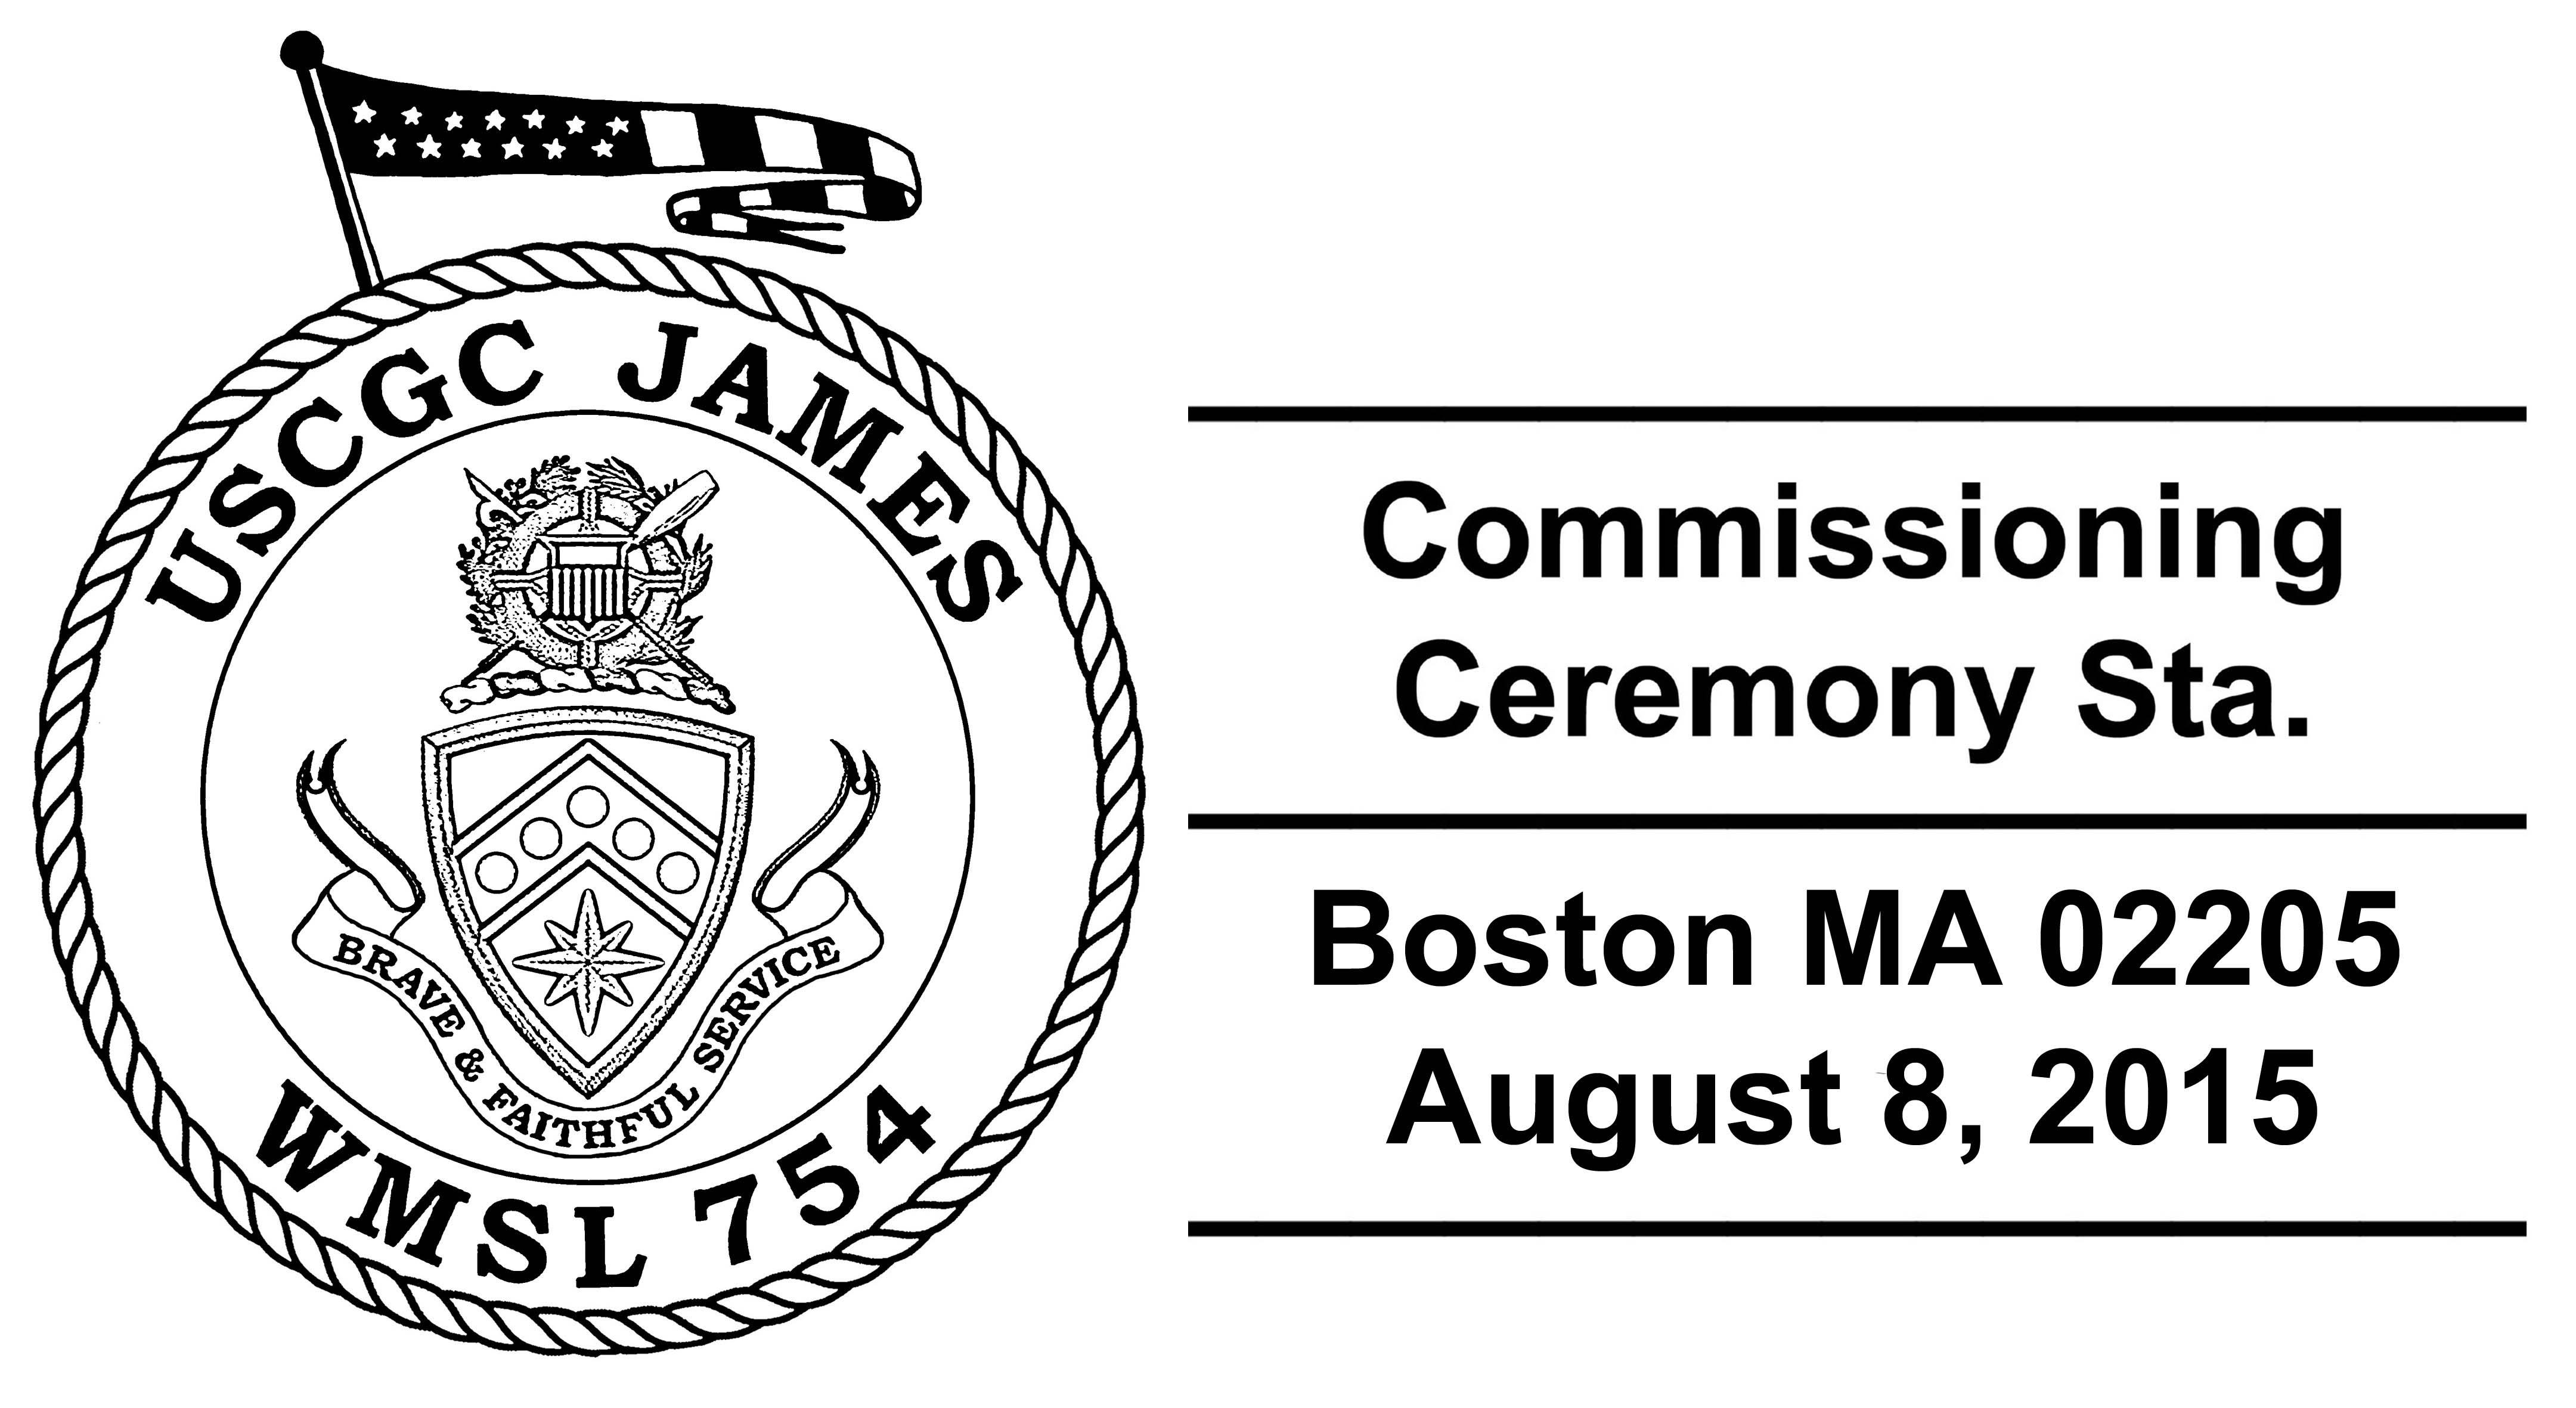 USCGC JAMES WMSL-754 Commissioning Sonderpoststempel Design: Wolfgang Hechler